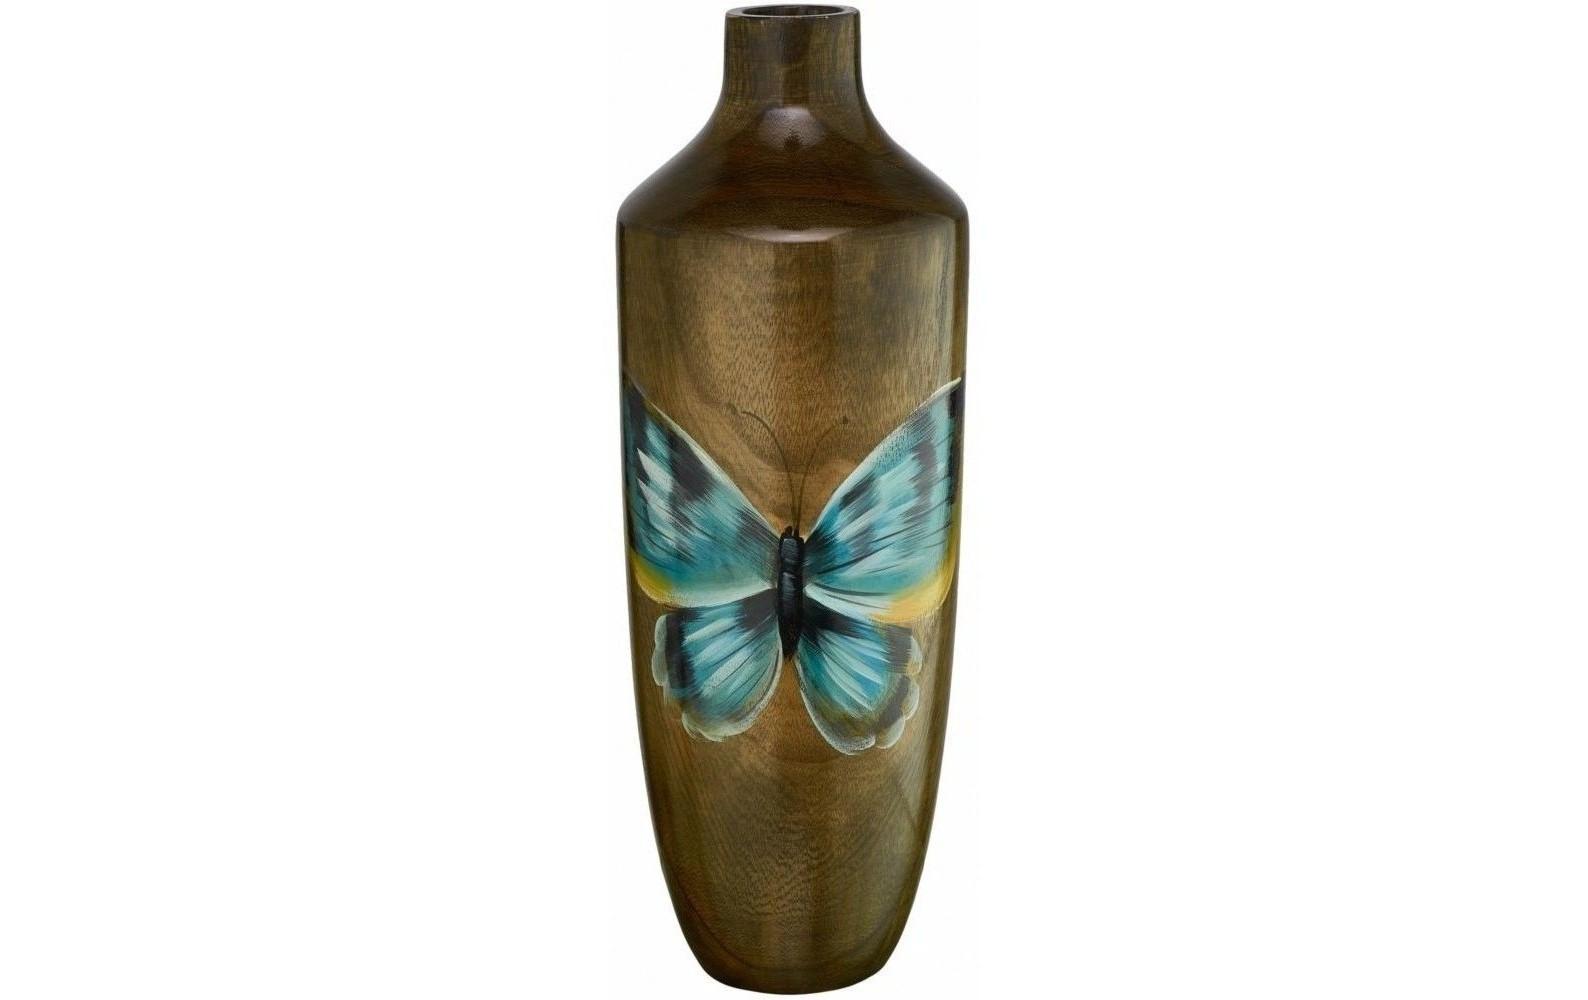 Декоративная ваза M-Style 5249837 от thefurnish